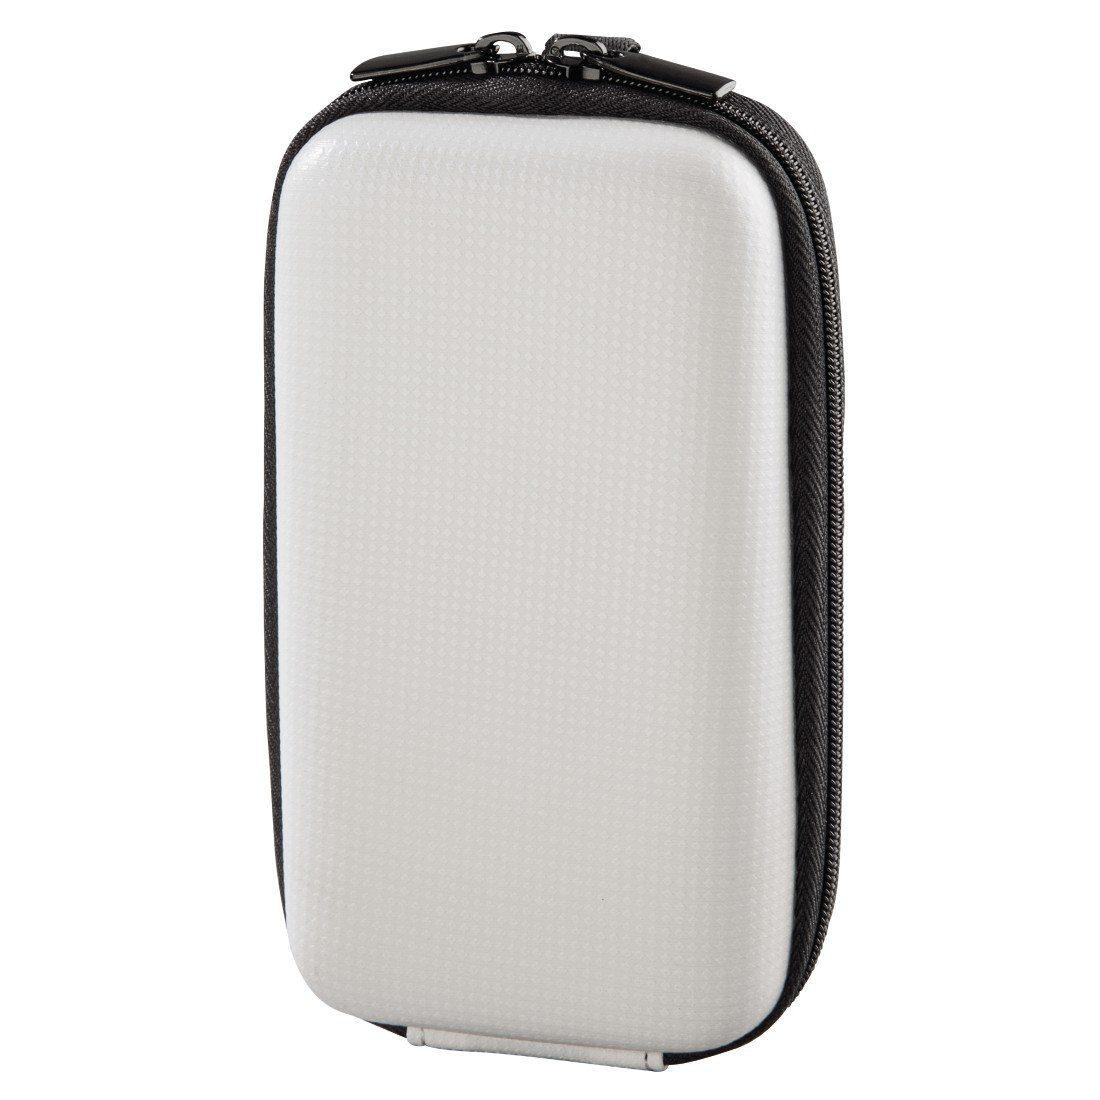 Hama Kameratasche Hardcase Galaxie, 90 H, Weiß